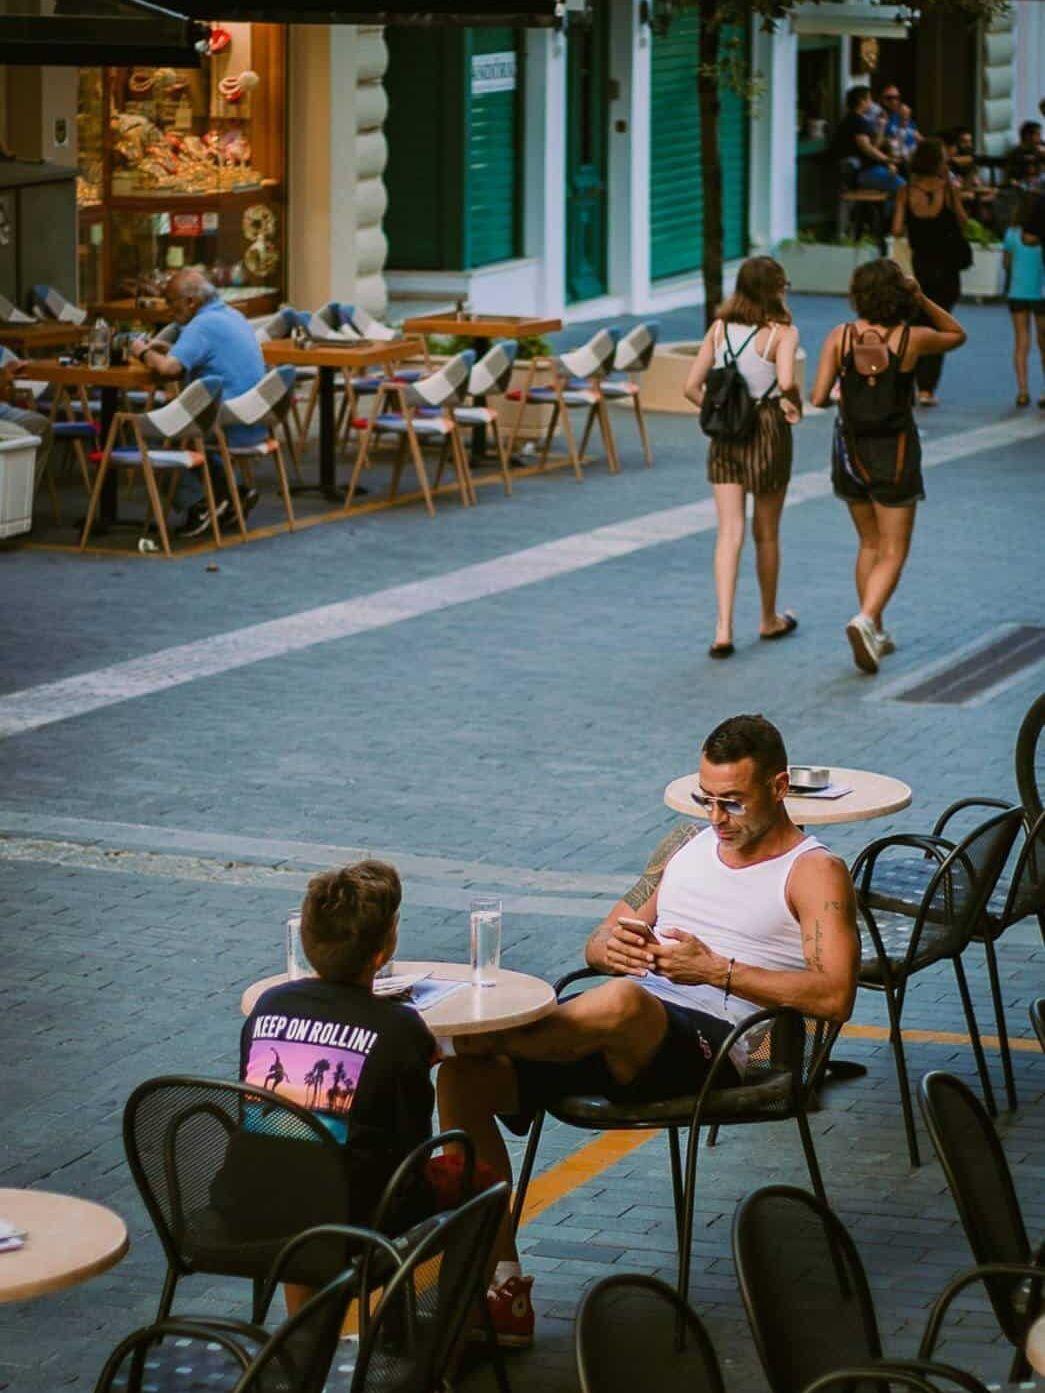 Streets of Heraklion Greece